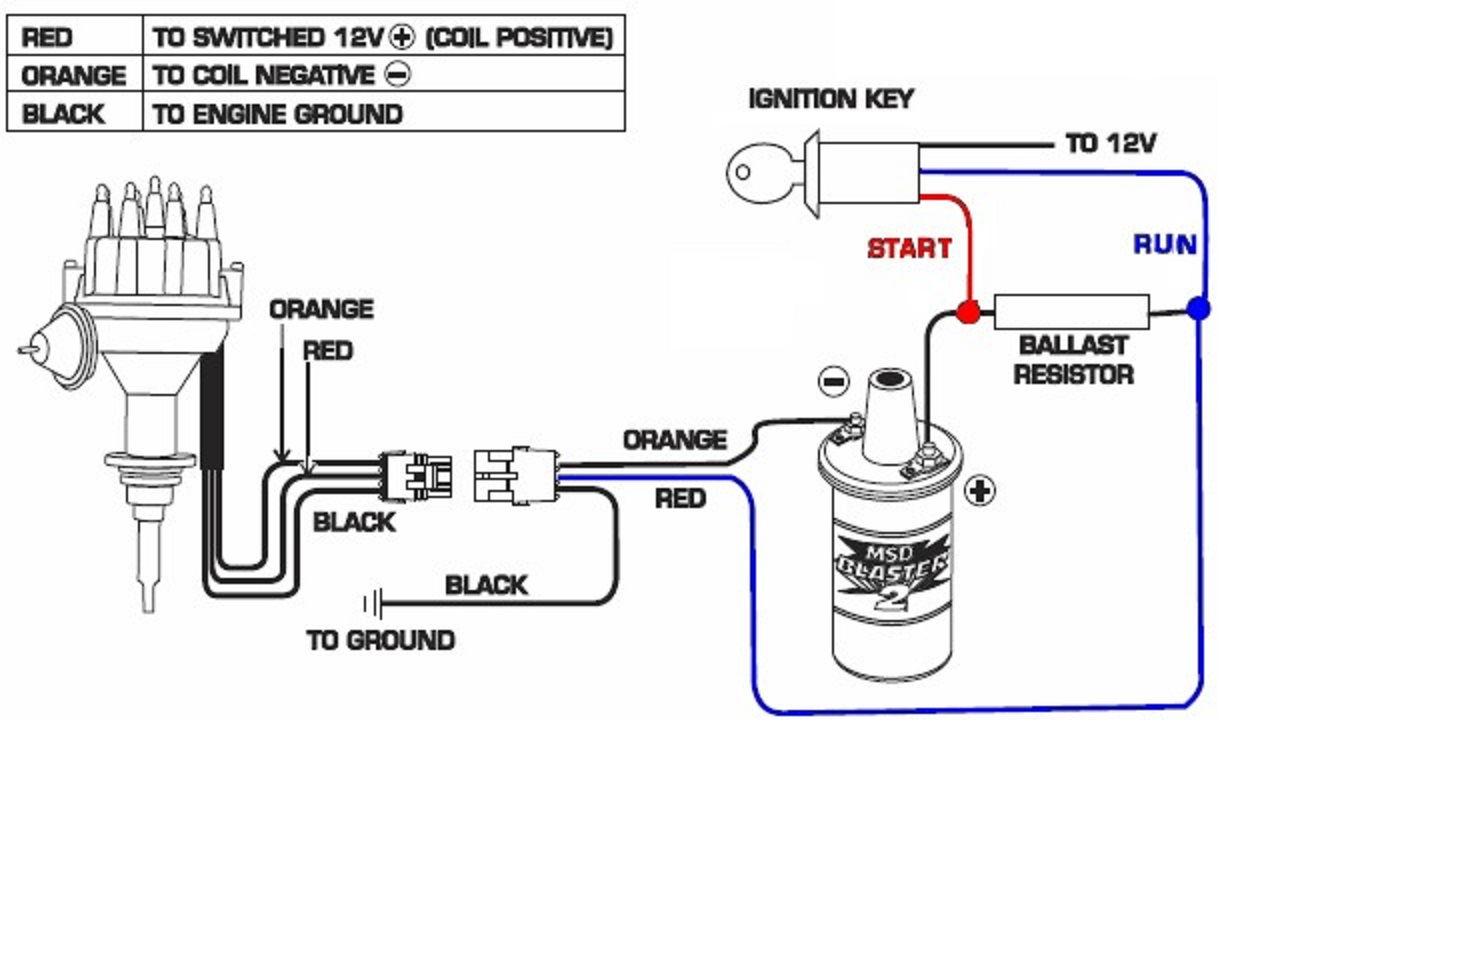 msd dist wiring car wiring diagram download cancross co Msd Pro Billet Distributor Wiring Diagram msd 8460 wiring diagram facbooik com msd dist wiring msd distributor wiring diagram wiring diagram msd pro billet distributor wiring diagram